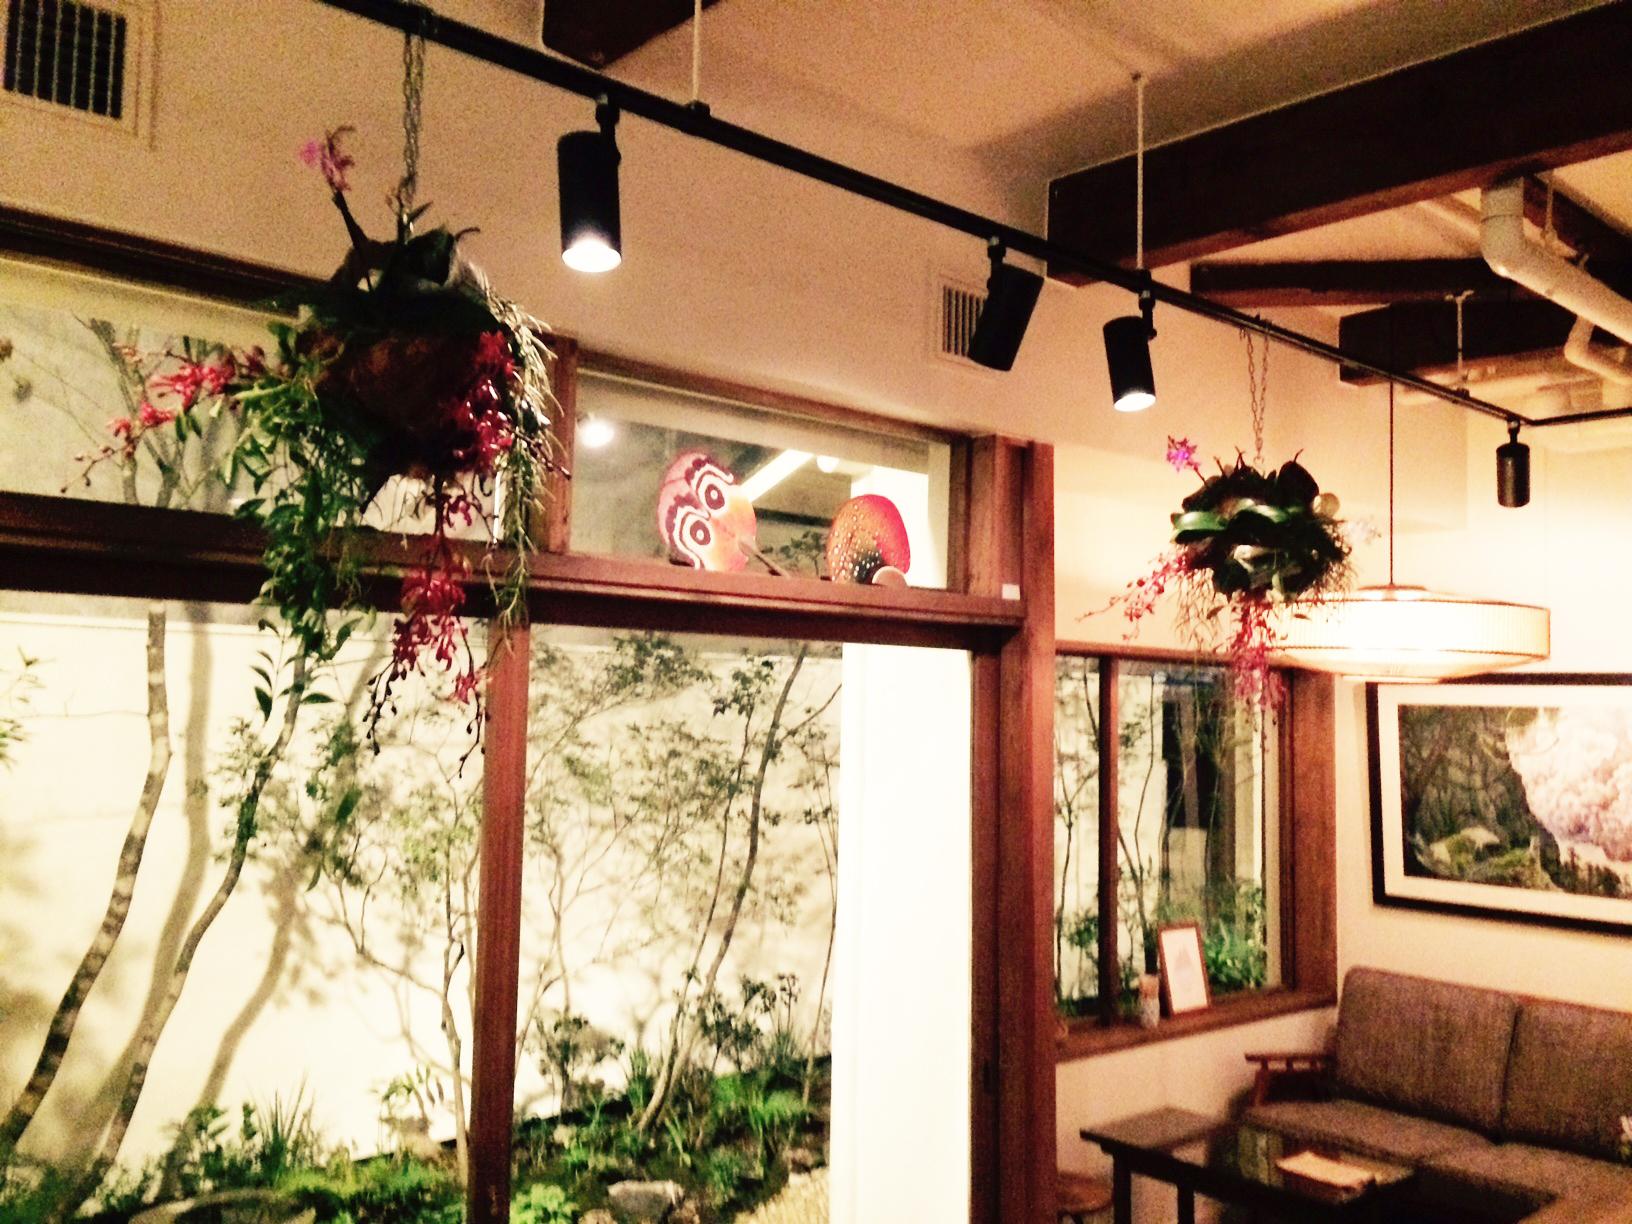 Exhibition at Kaisu, Tokyo